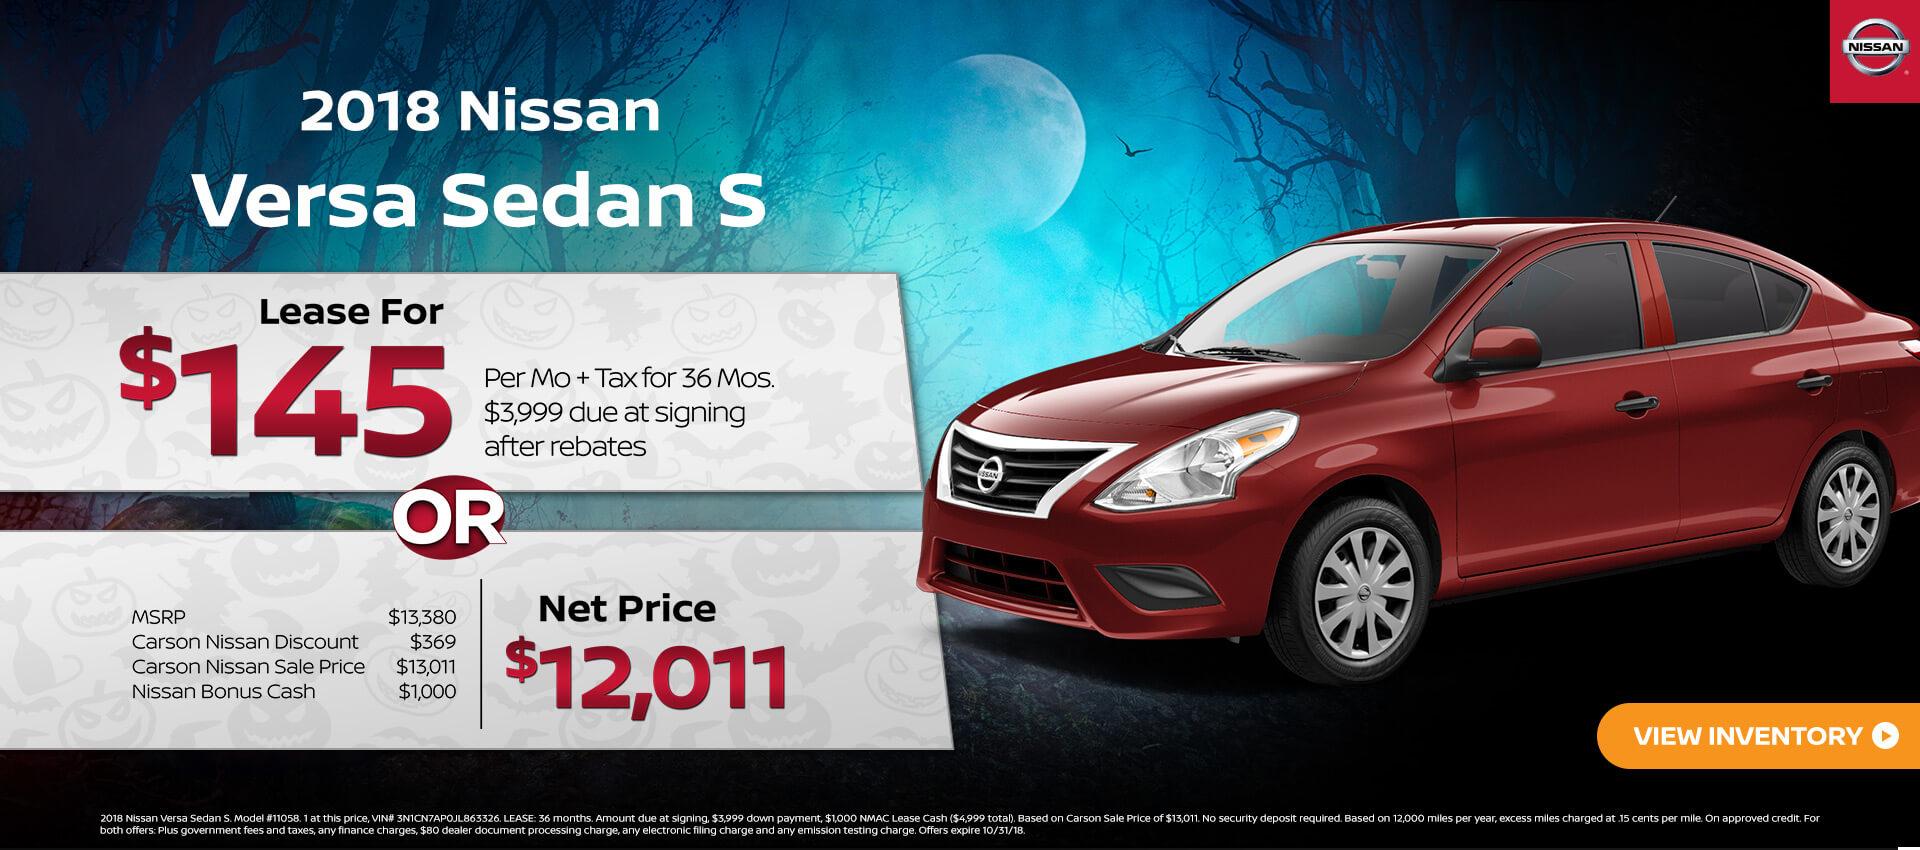 Homepage Specials. 2018 Nissan Versa Sedan